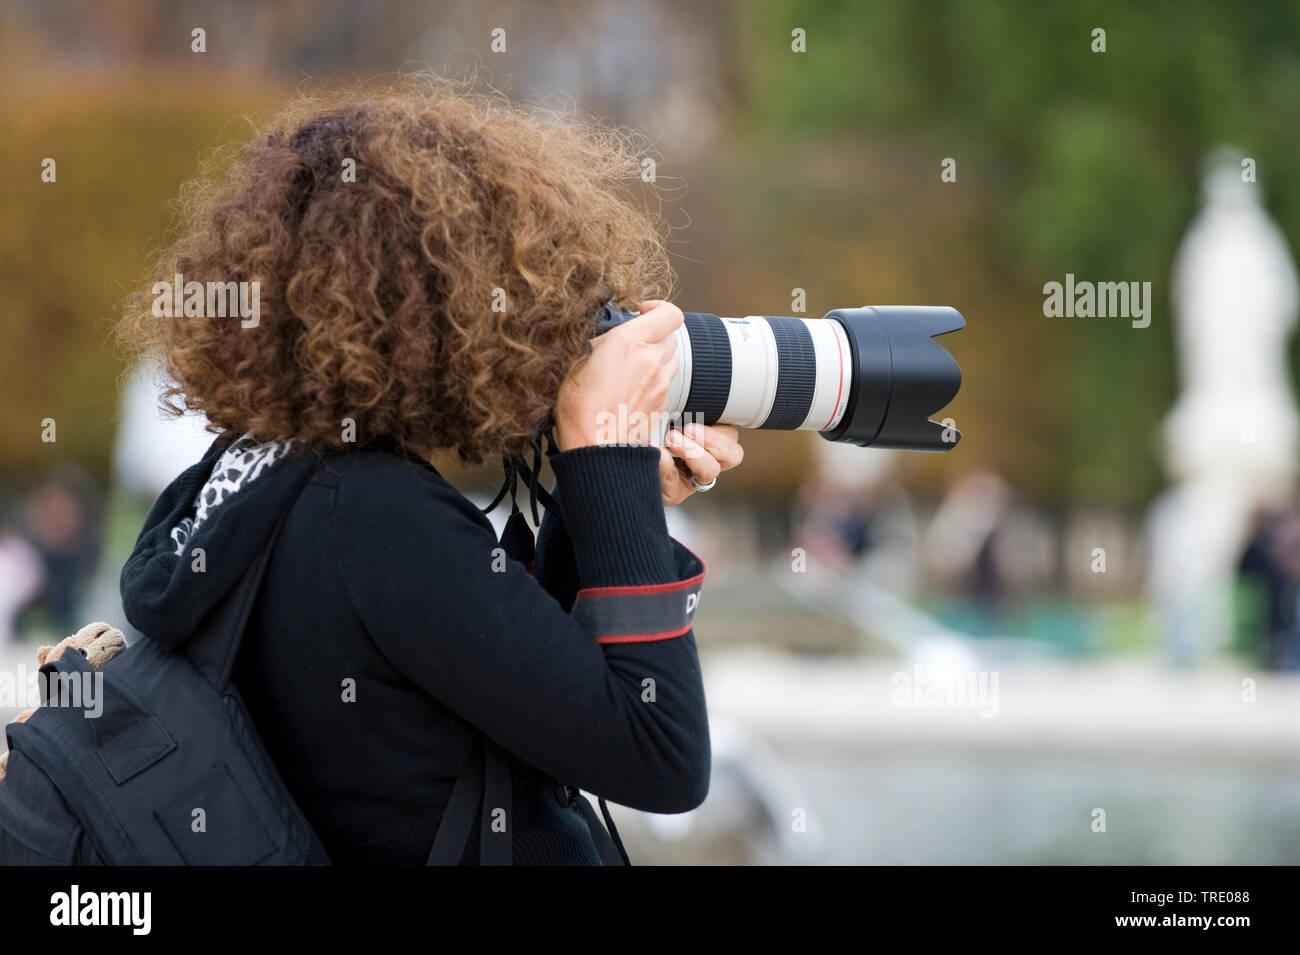 Frau mit professioneller Kamera mit Teleobjektiv | Woman with professional camera with long tele lenses | BLWS513117.jpg [ (c) blickwinkel/McPHOTO/M. - Stock Image